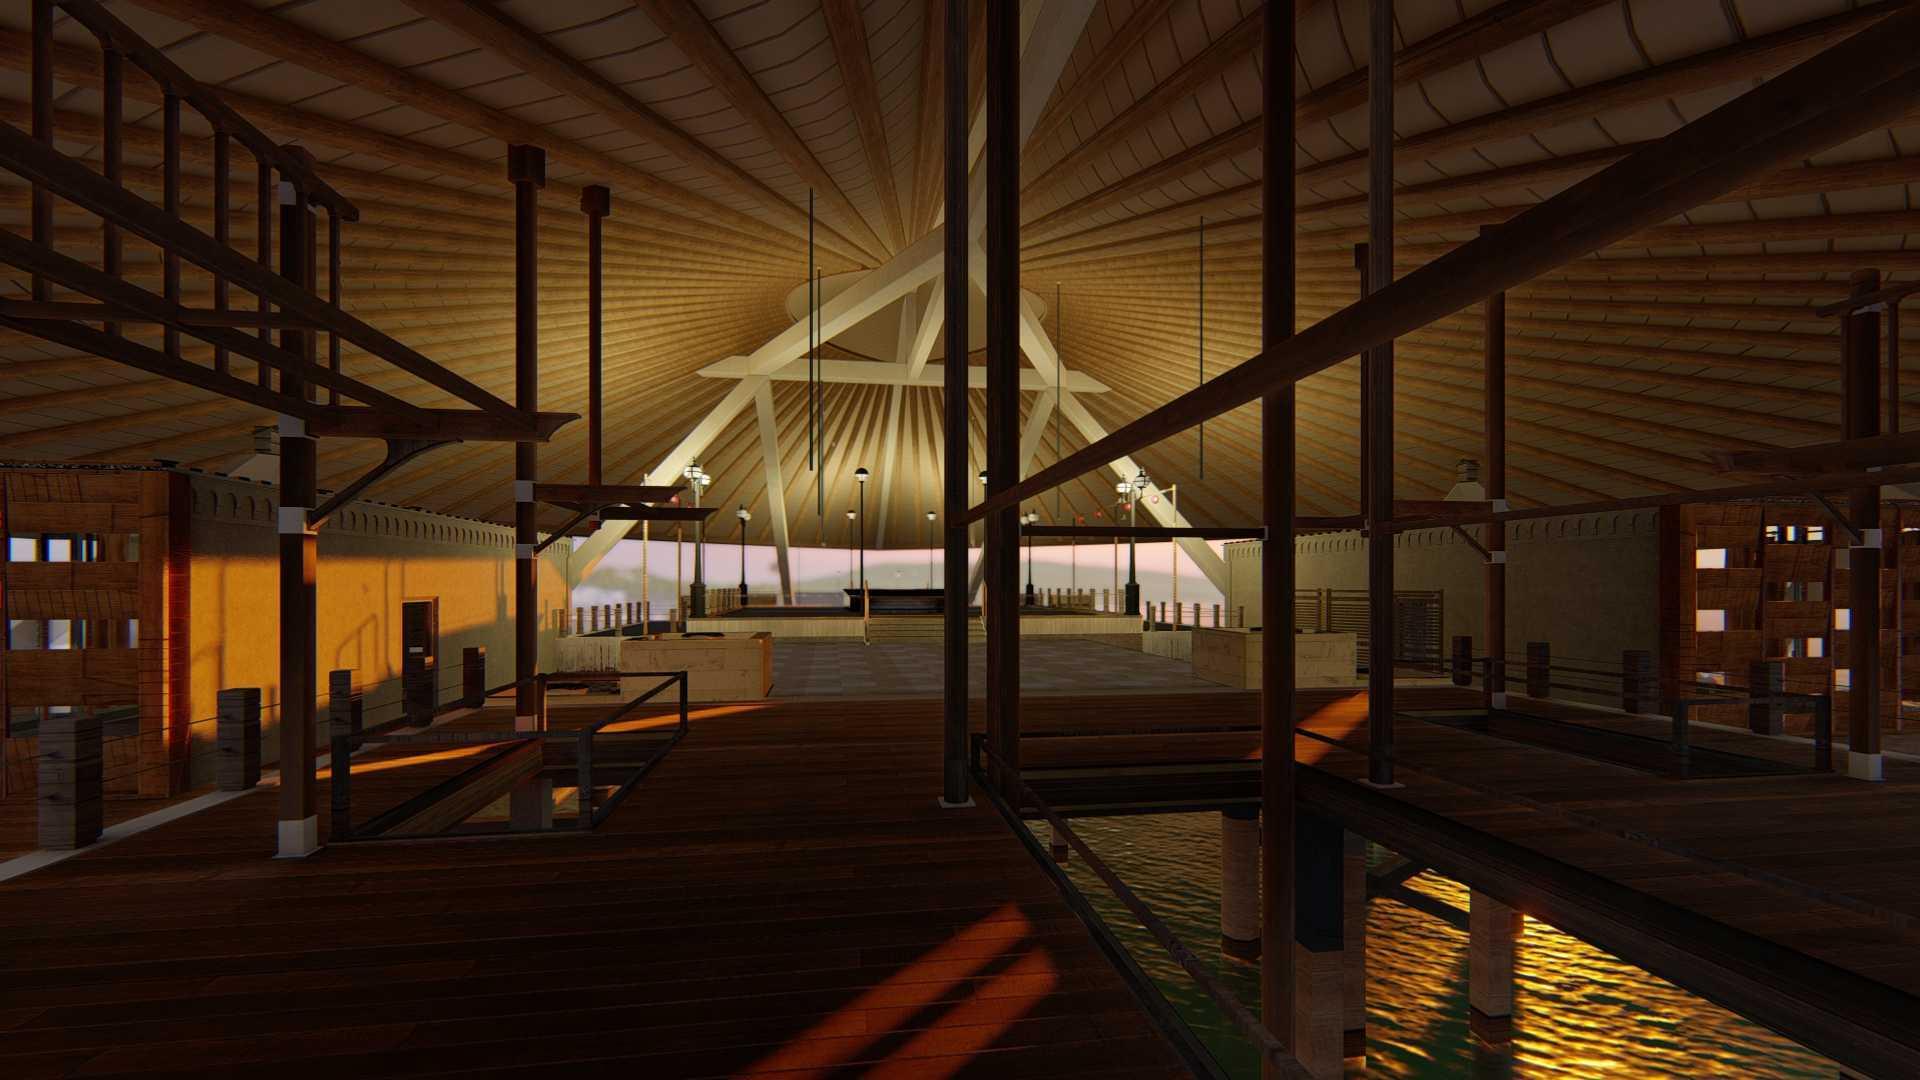 Davay Dasvidaniya (Pt Davay Sejahtera Indonesia) Galdina Dock - The New Jakabaring Sport City 15 Ulu, Kecamatan Seberang Ulu I, Kota Palembang, Sumatera Selatan 30267, Indonesia 15 Ulu, Kecamatan Seberang Ulu I, Kota Palembang, Sumatera Selatan 30267, Indonesia Davay-Dasvidaniya-Pt-Davay-Sejahtera-Indonesia-The-New-Jakabaring-Sport-City  80929